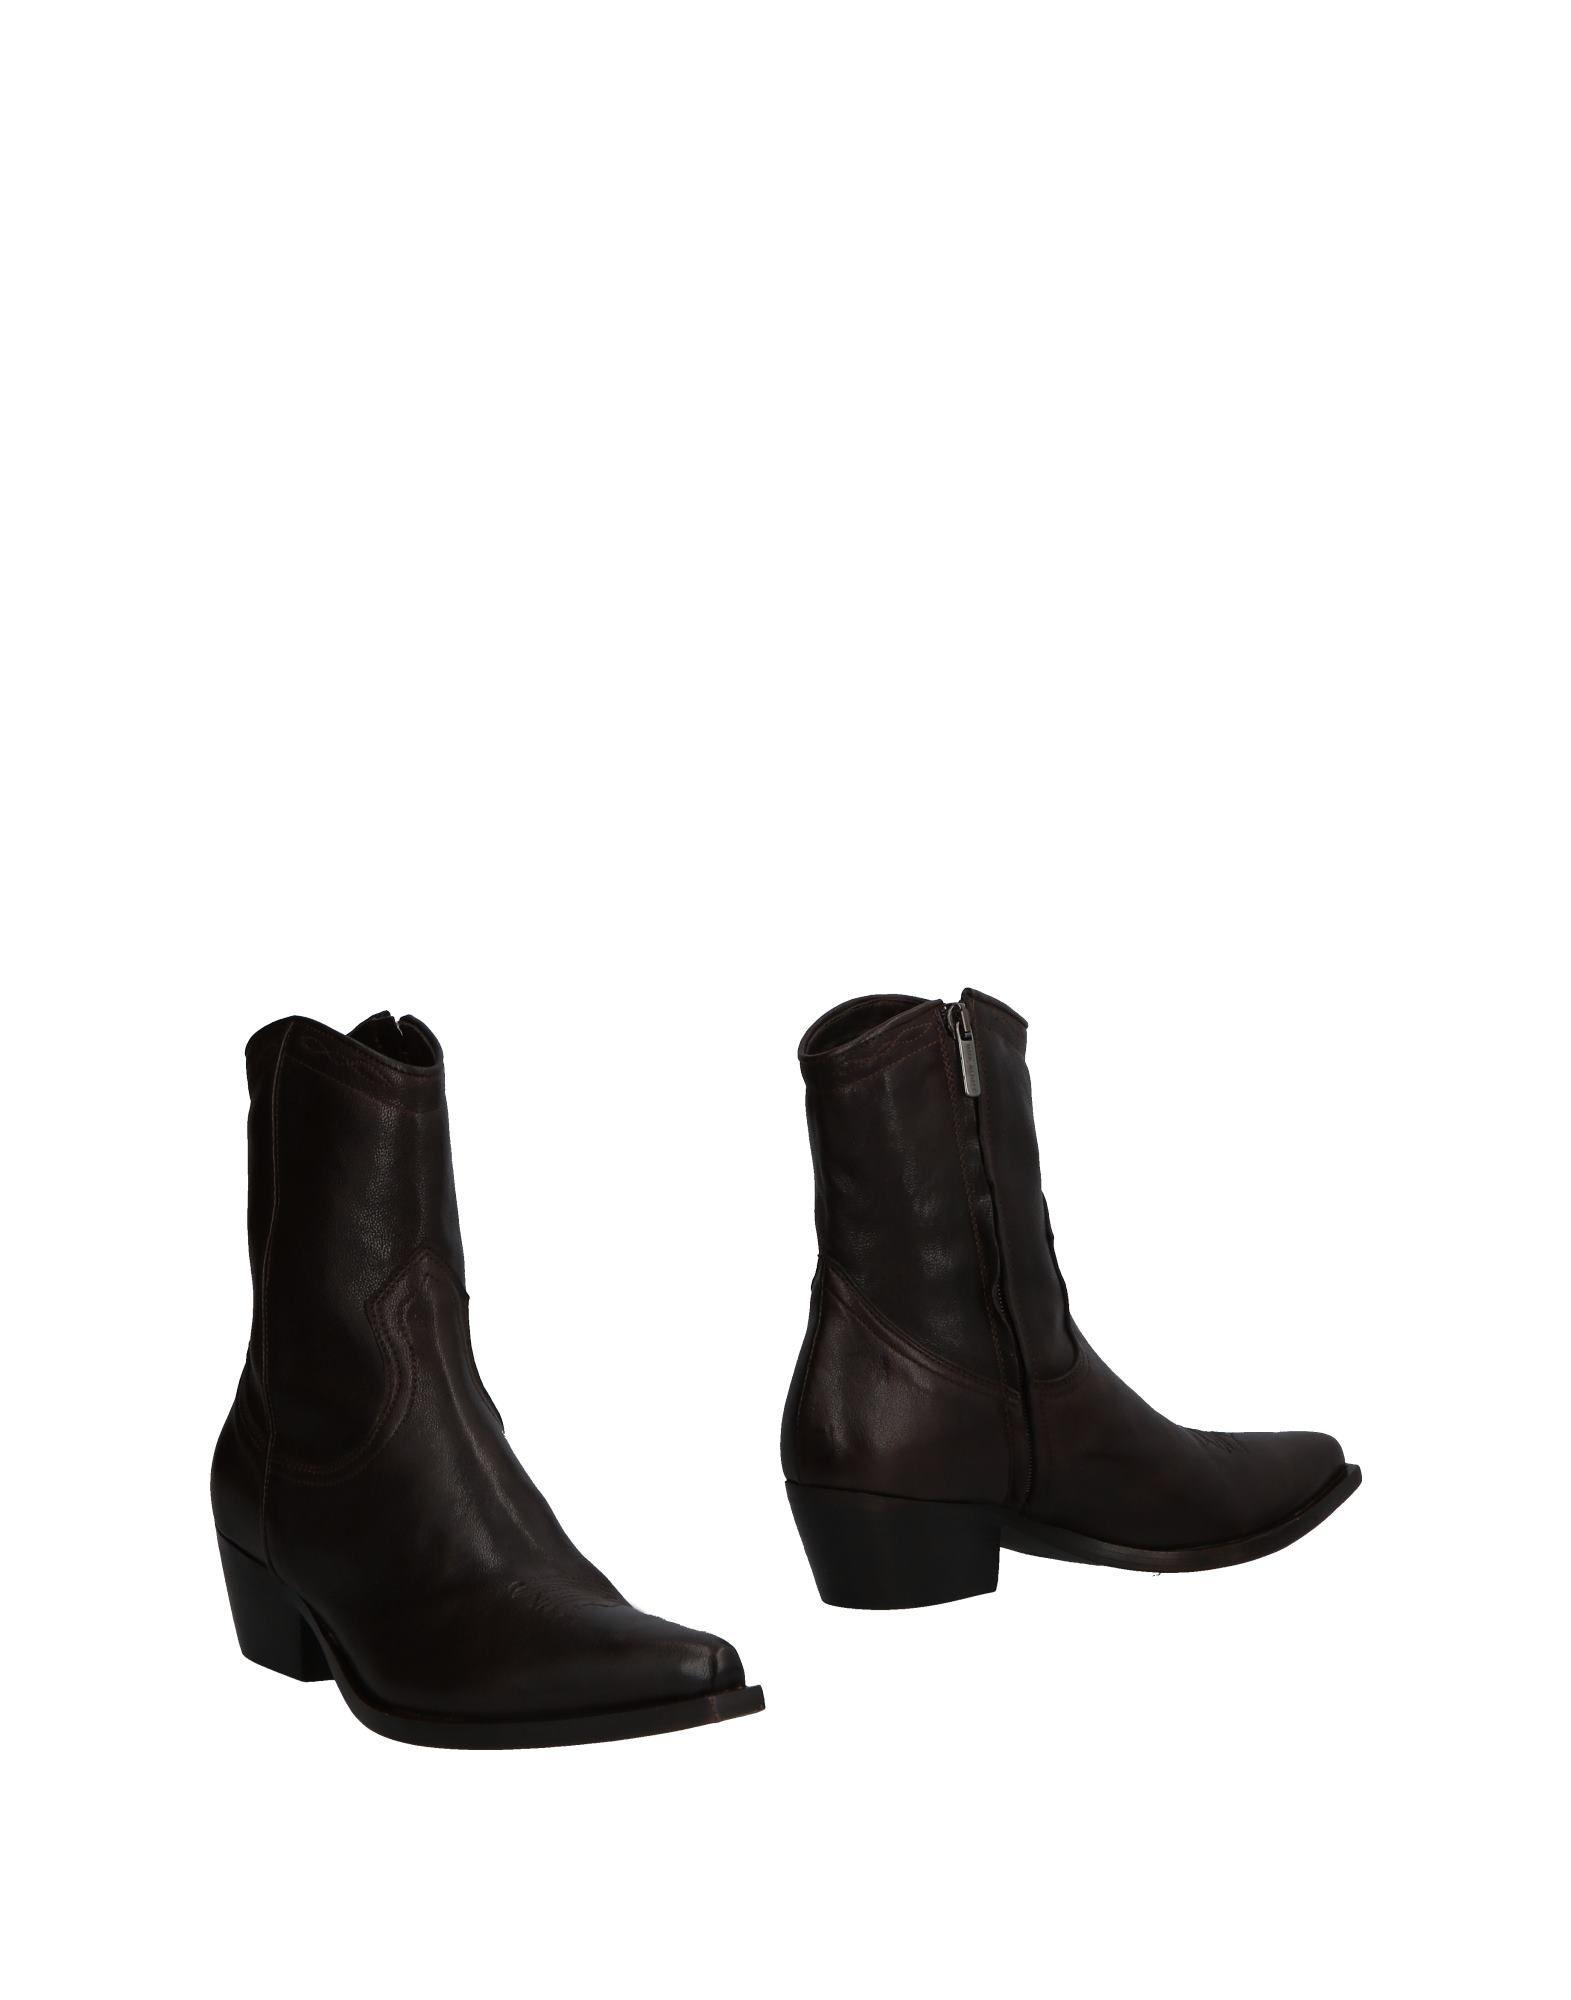 Stilvolle Valentini billige Schuhe Luca Valentini Stilvolle Stiefelette Damen  11496025SH 0eda75